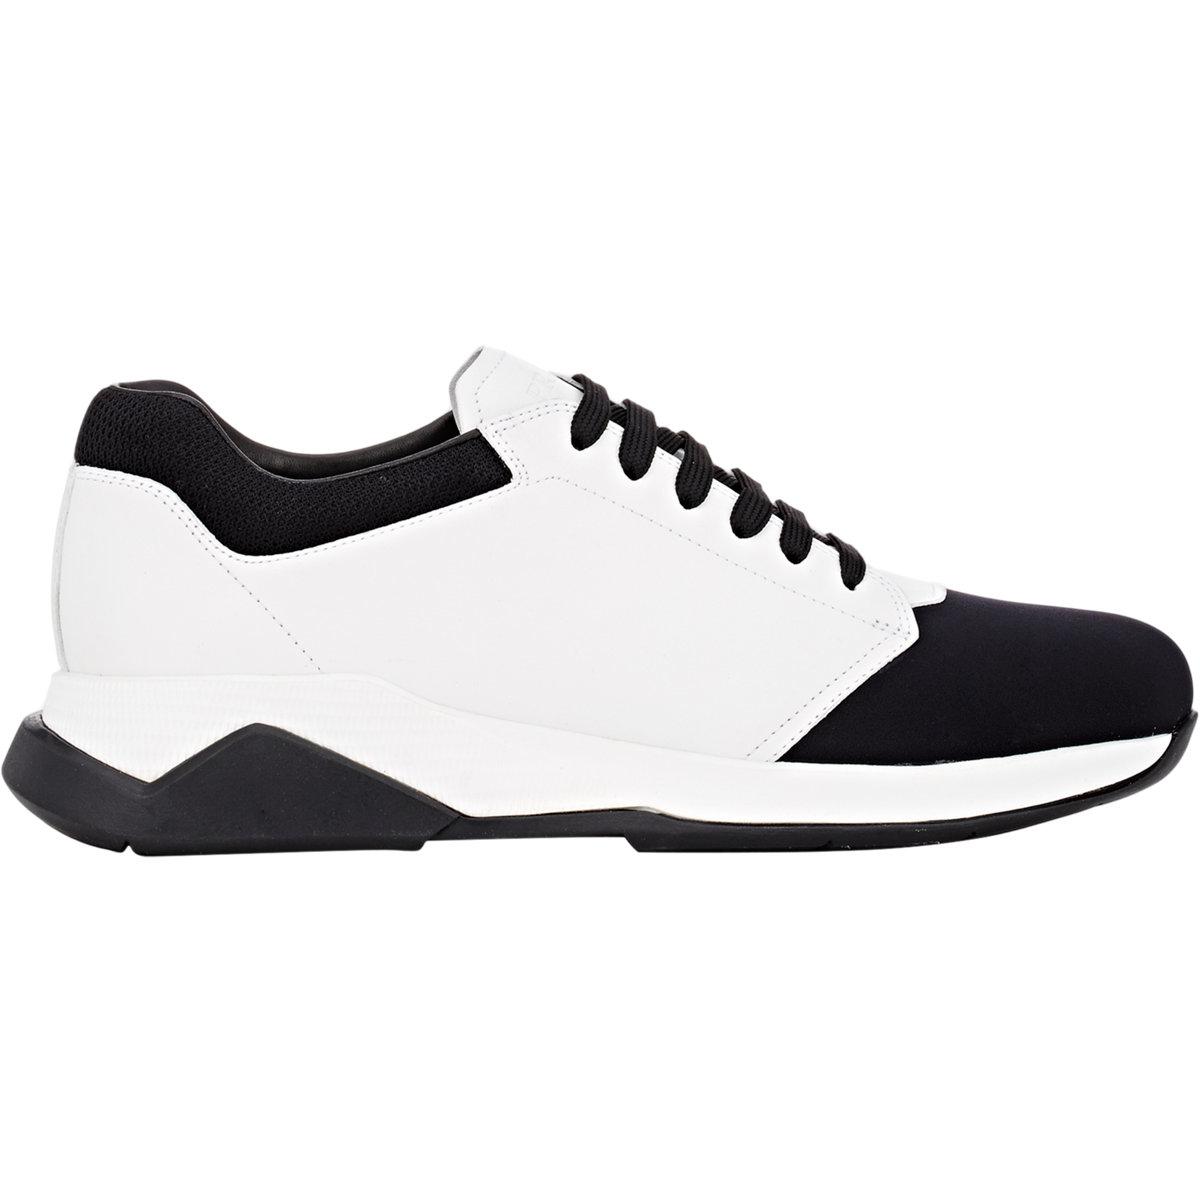 a0dc52506b5be Lyst - Prada Leather Neoprene Sneakers for Men arrives 0ec17 41910  Lyst -  Prada Frog Neoprene High Top Trainers in Black ...